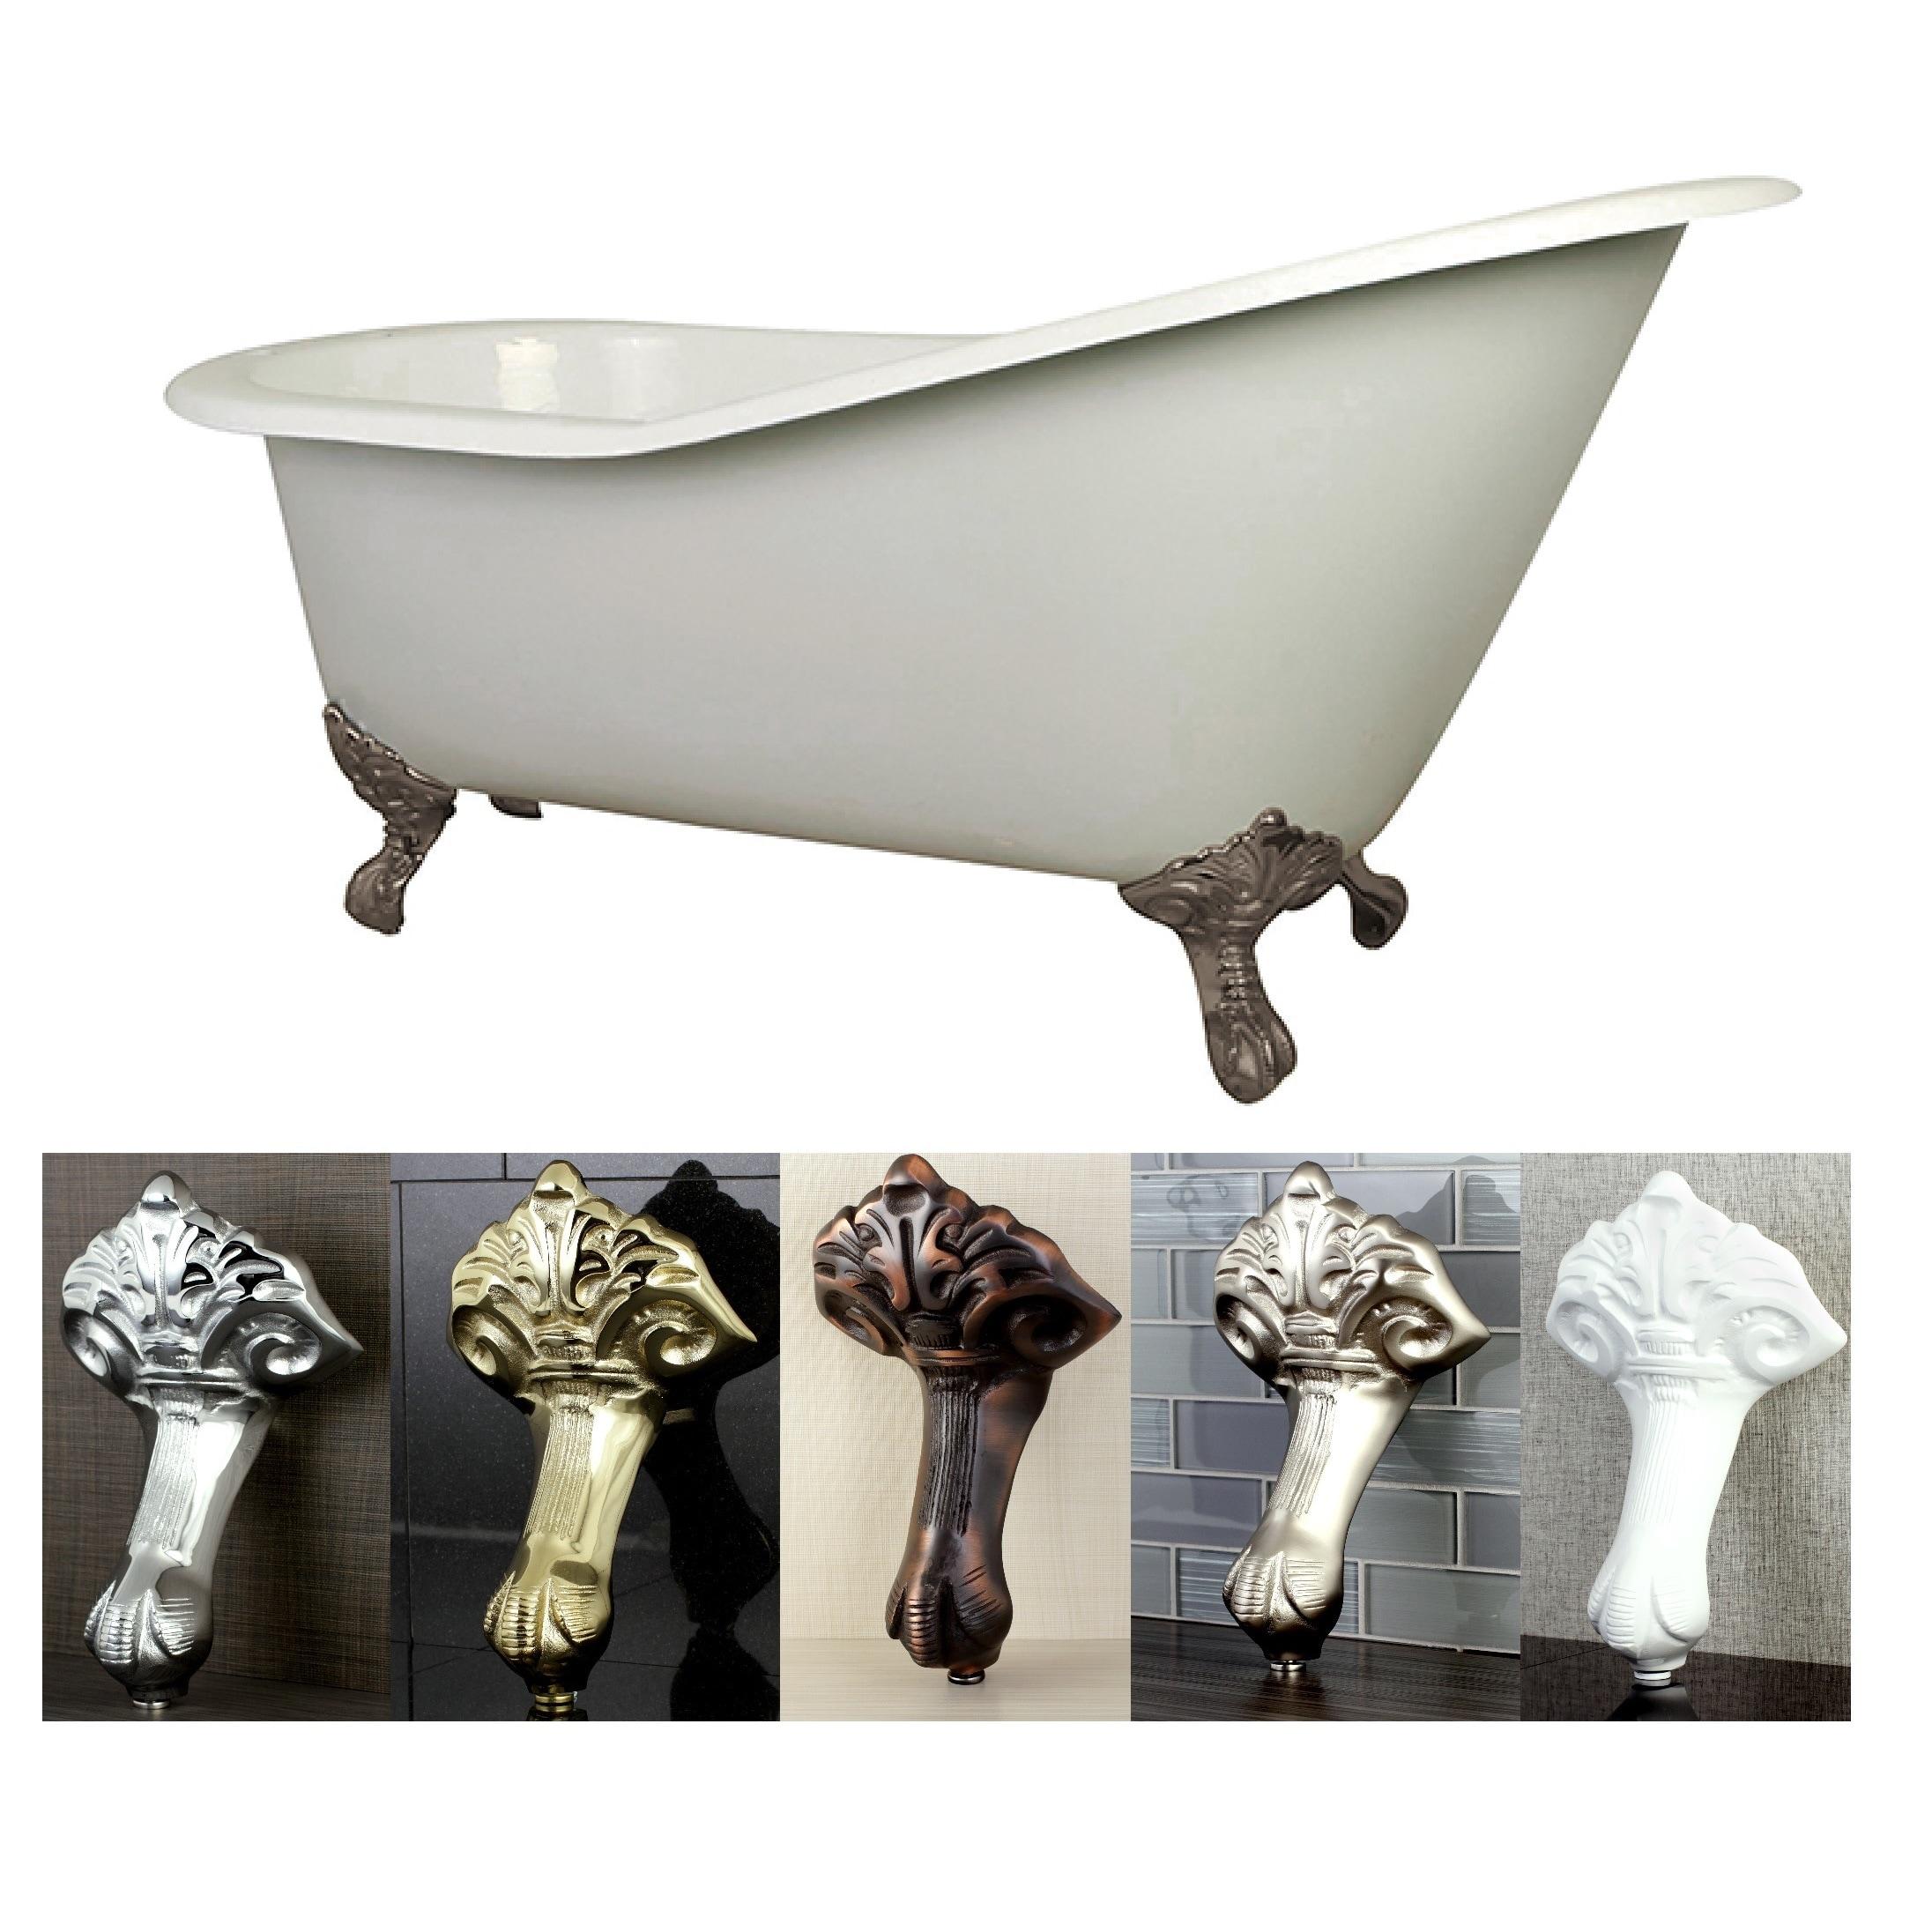 Vintage Slipper 61 Inch Cast Iron Clawfoot Tub